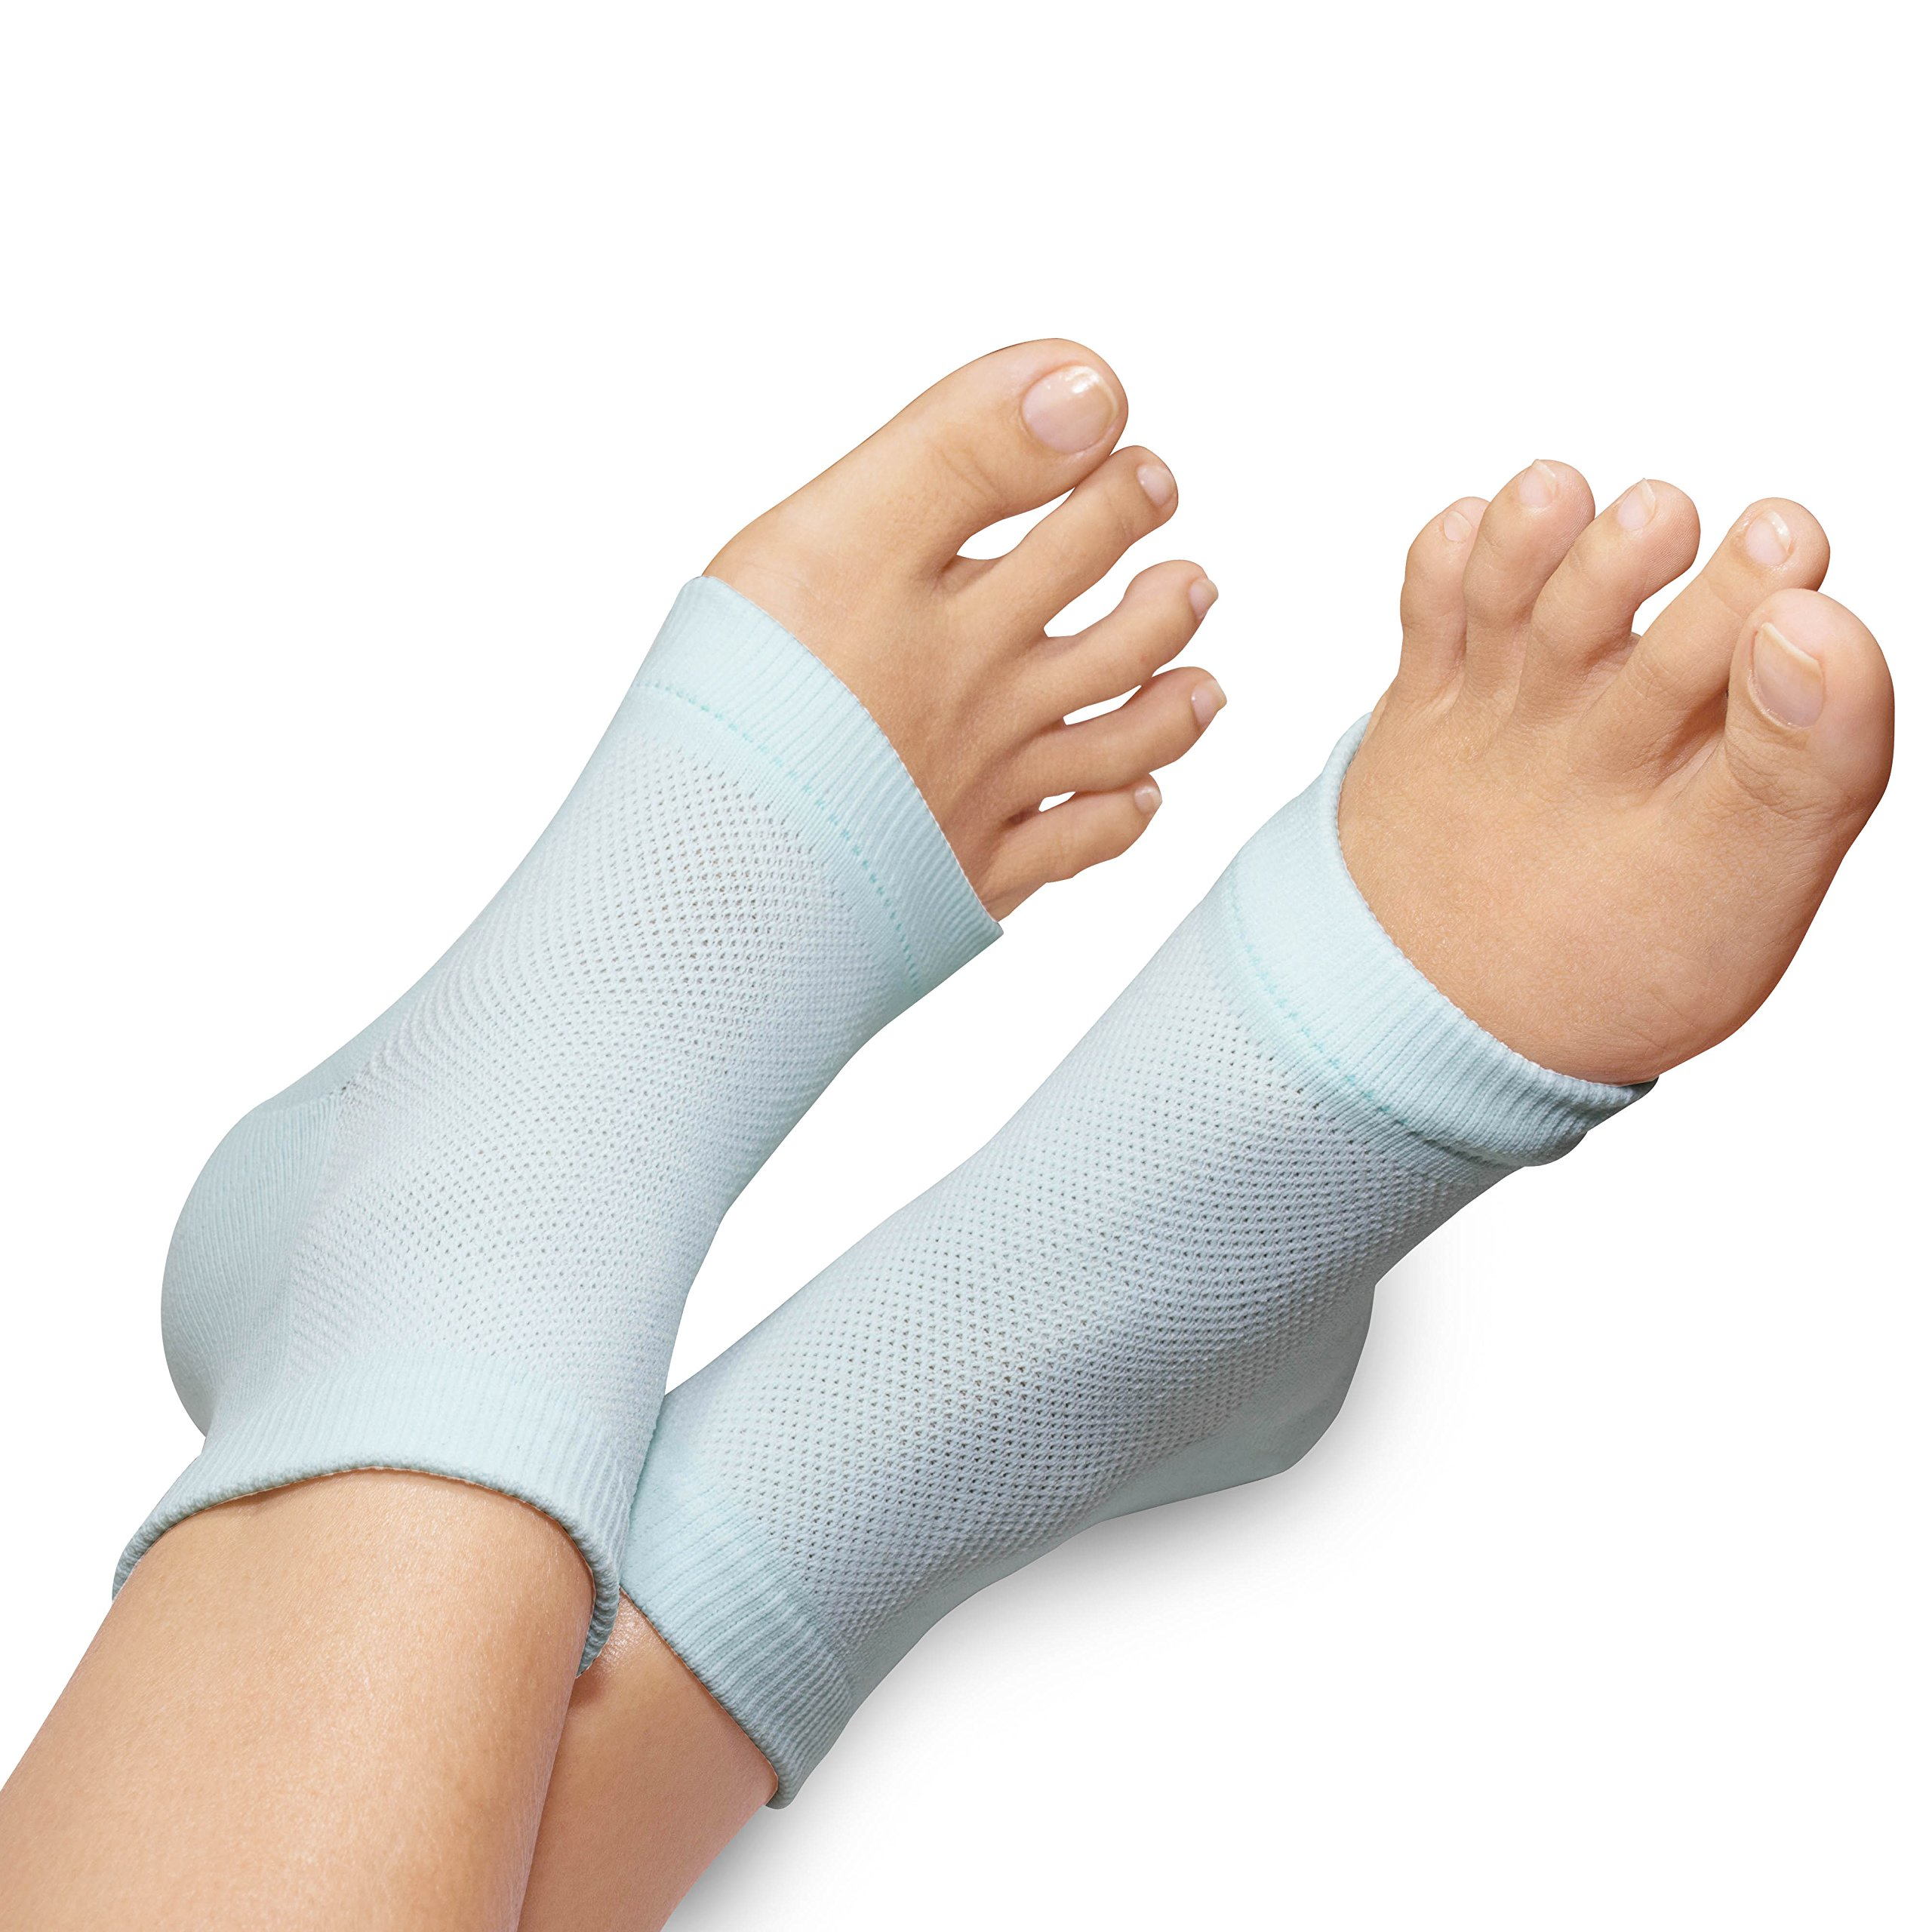 3 PAIRS-Moisturizing Gel Heel Socks w/ Enriched Vitamins for Dry Hard Cracked Heels & DIY Simple Home Remedies by Triim Fitness by Triim Fitness (Image #7)